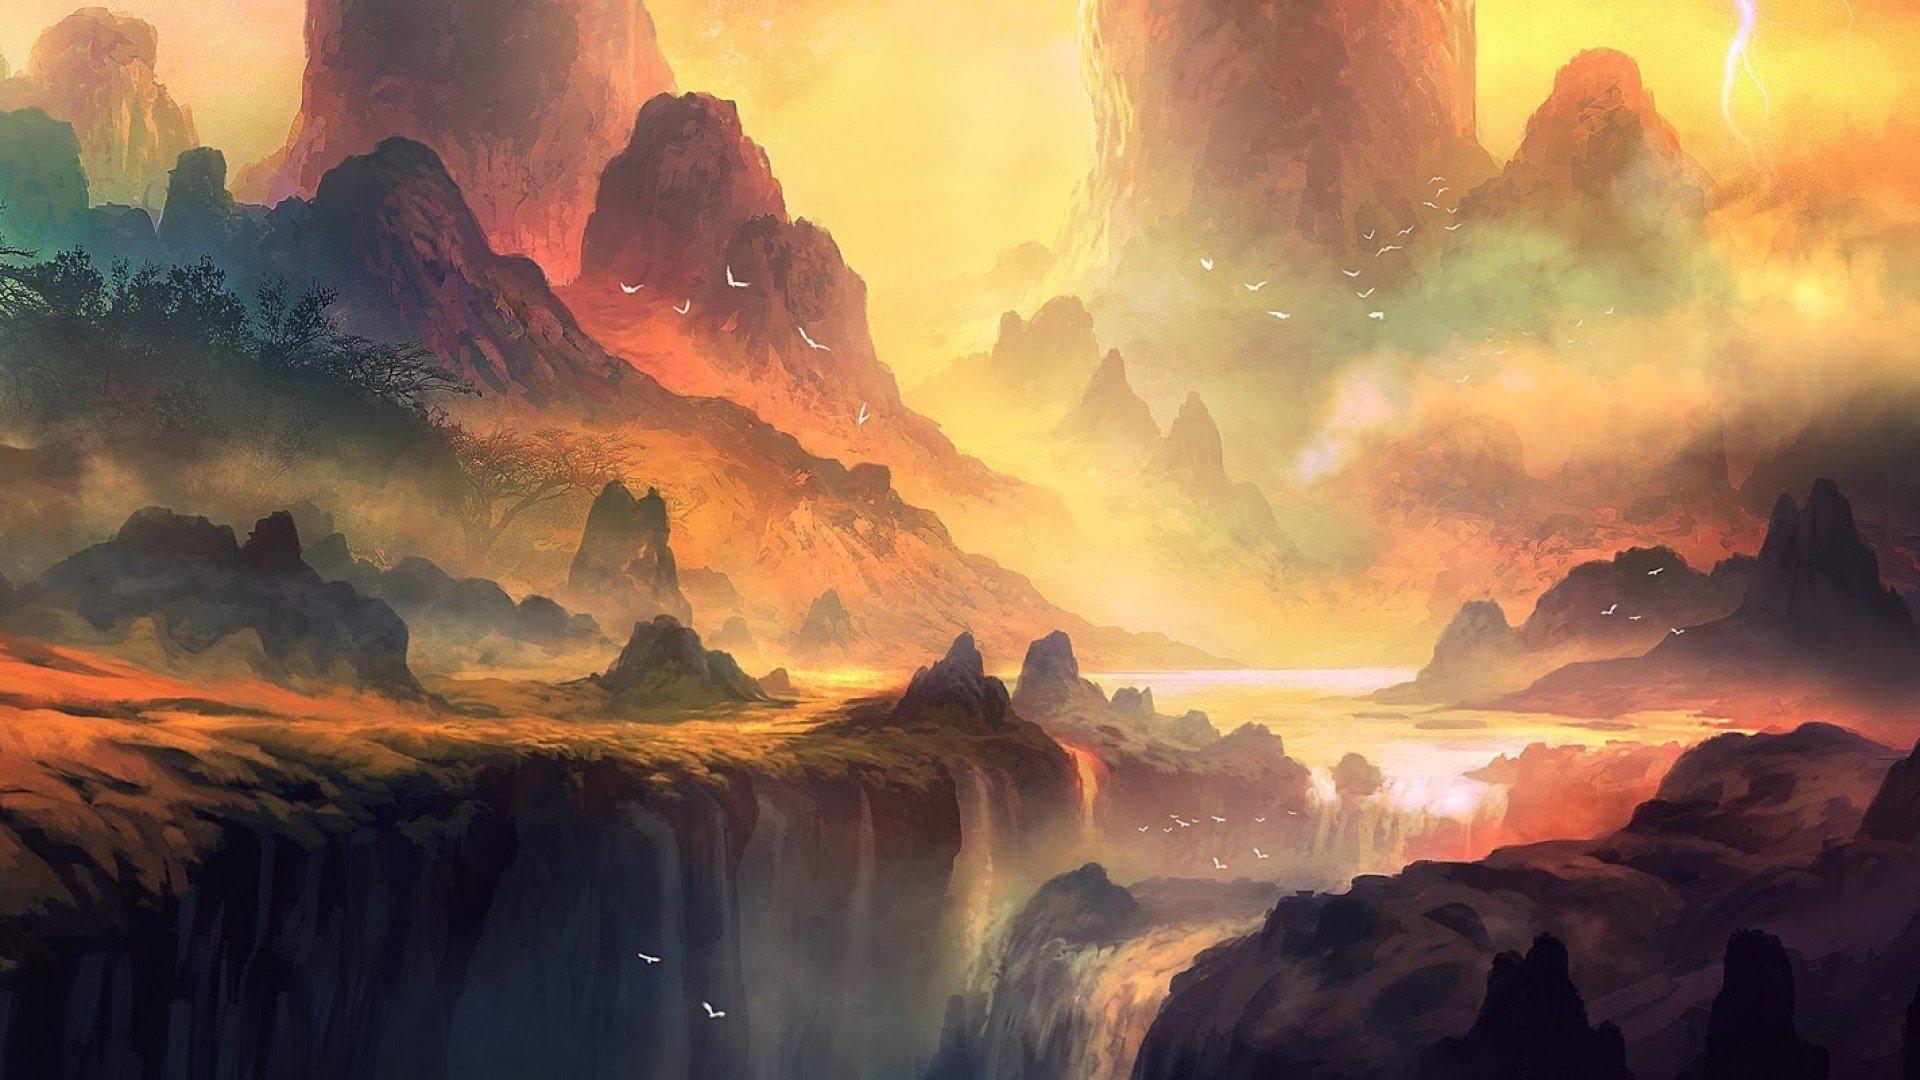 Mrsuicidesheep Wallpaper Fall Artwork Landscape Mountains Waterfall Sunlight Fantasy Art